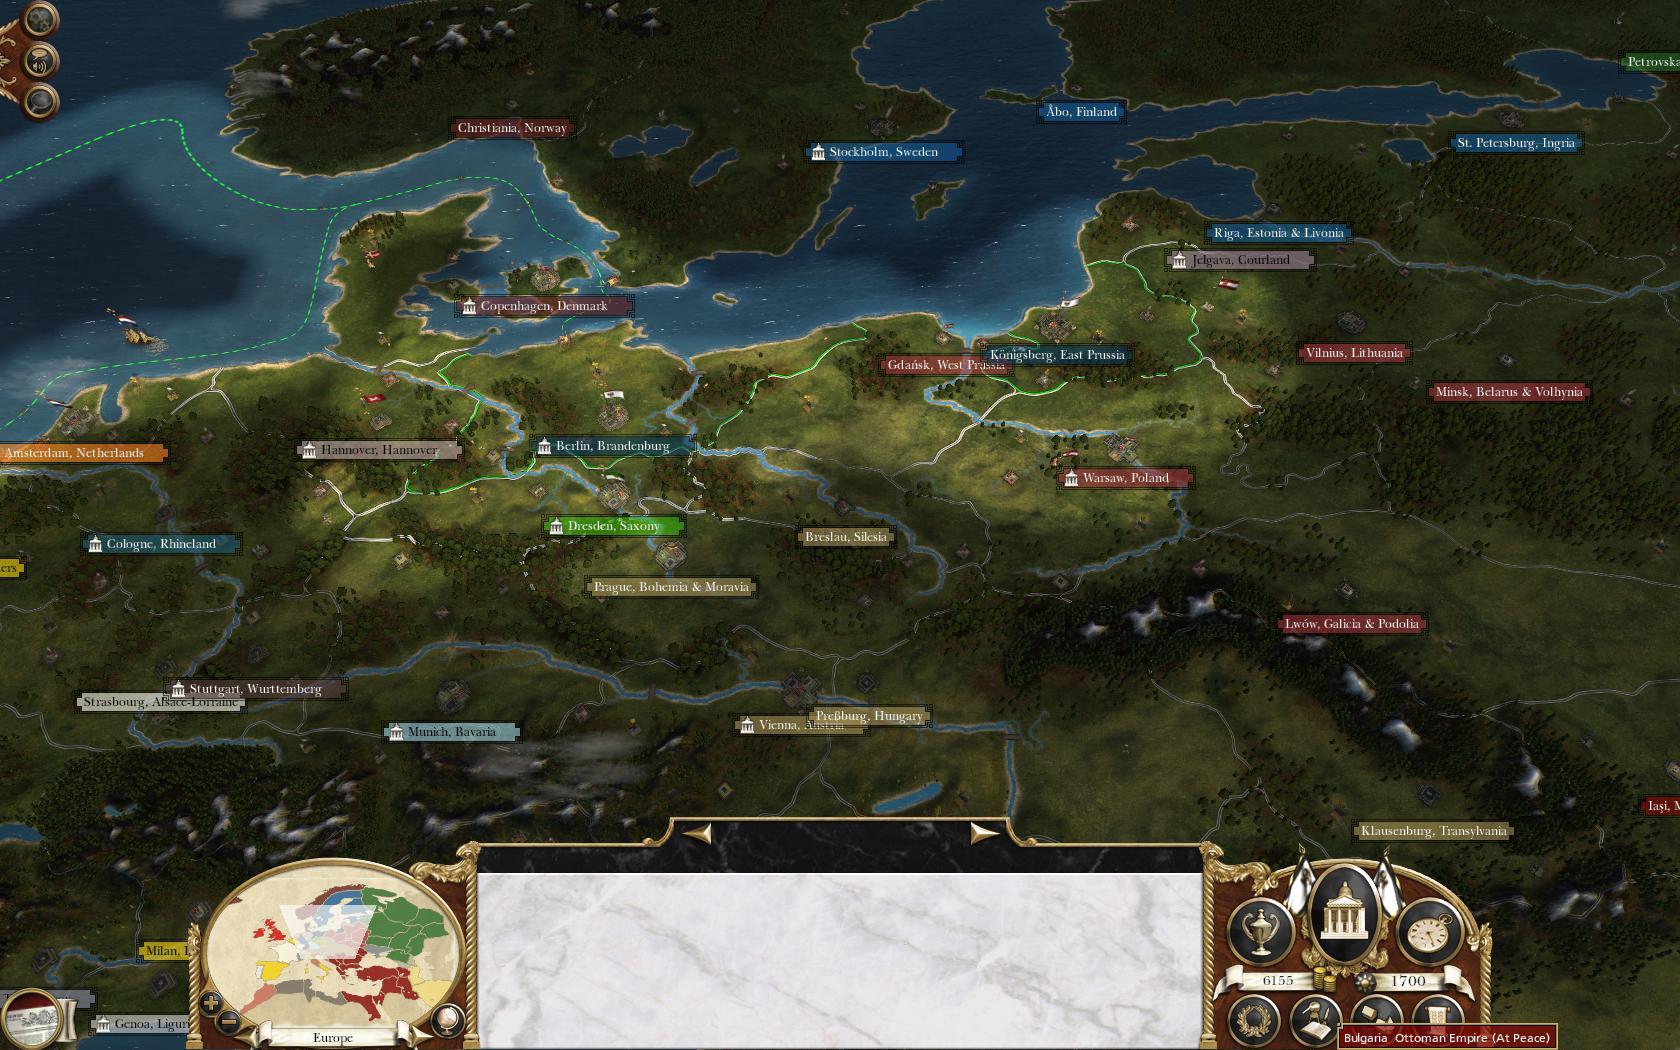 Картинки по запросу total war empire map